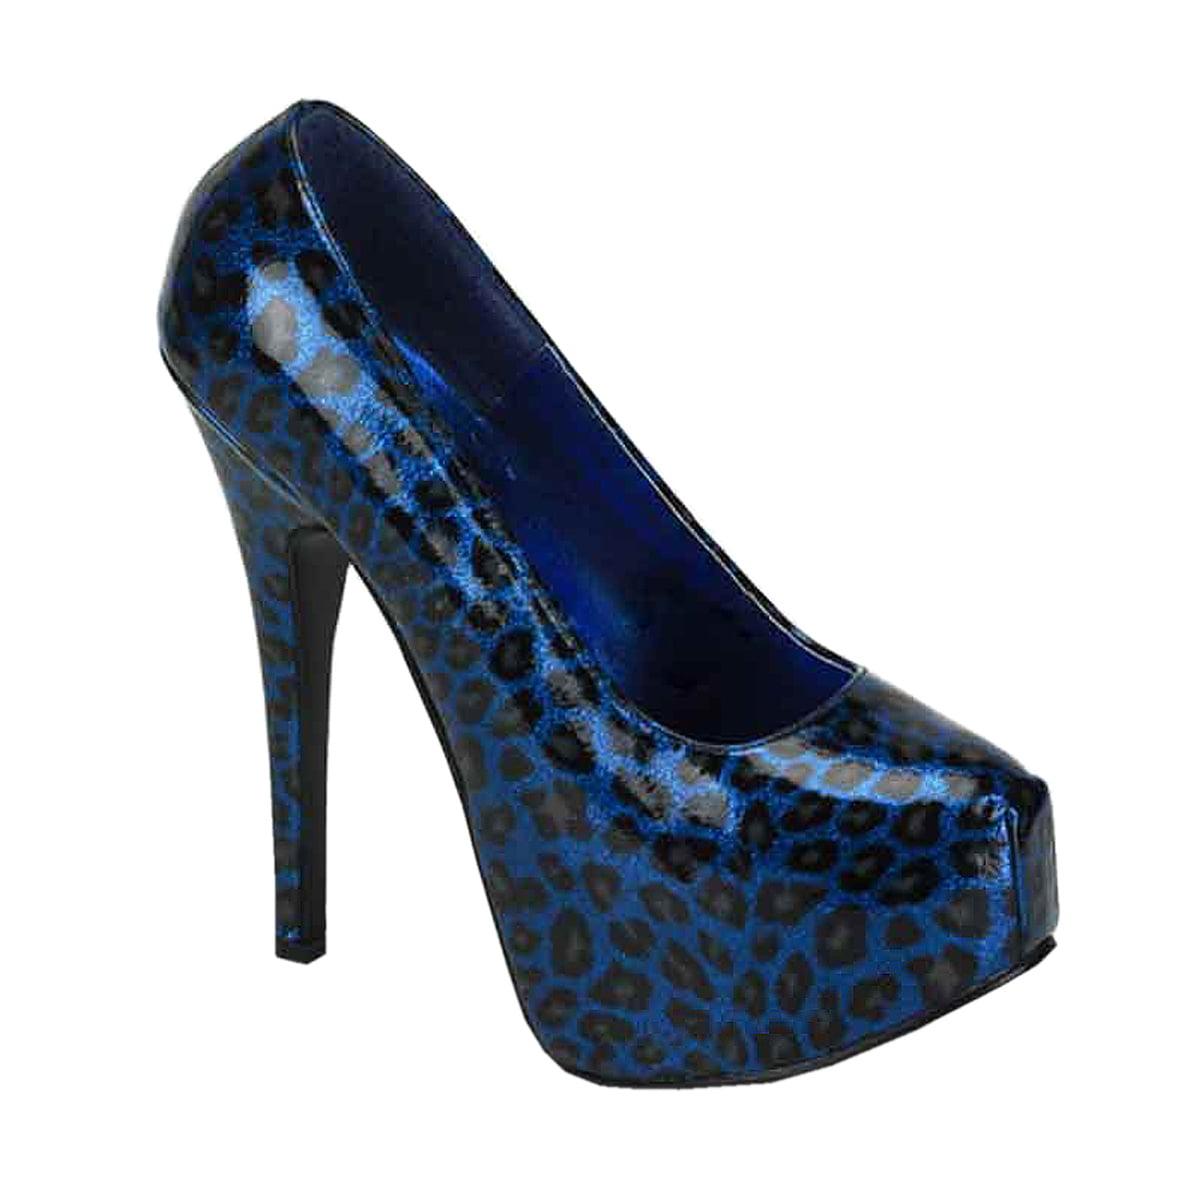 Womens 3/4 Animal Print Pumps 5 3/4 Womens Inch Heel Metallic Leopard Shoes Closed Toe 90559d